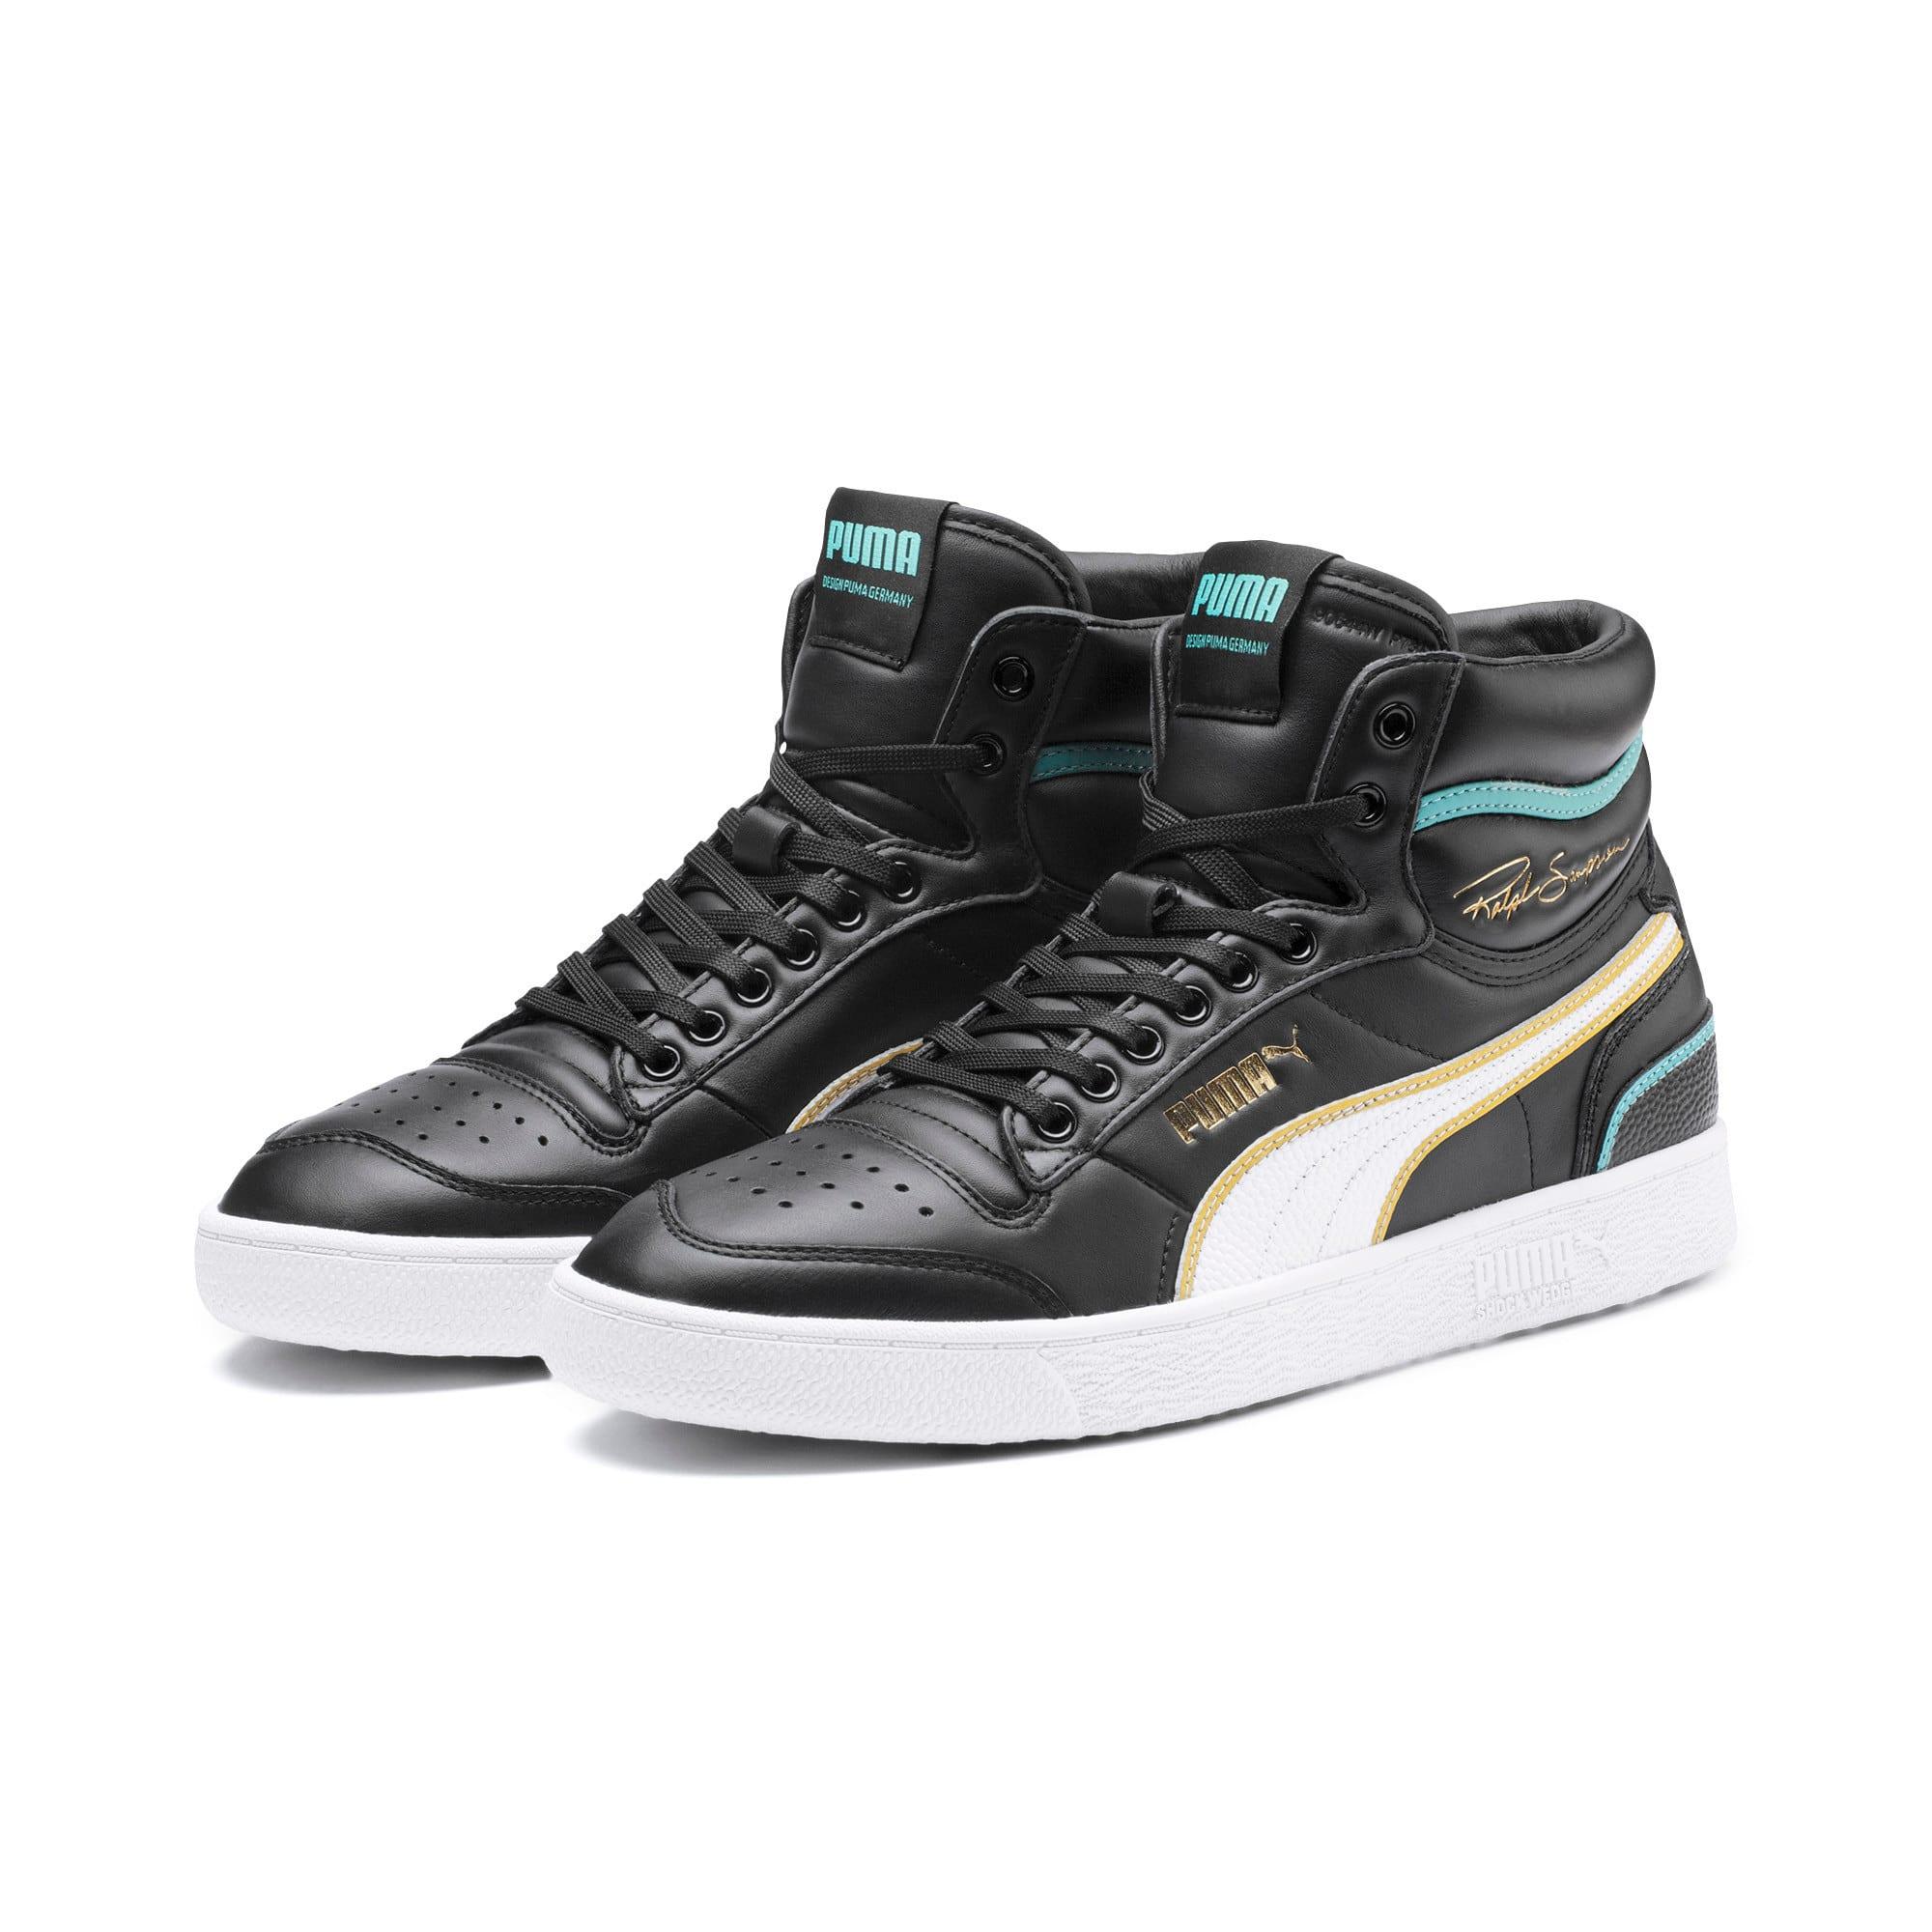 Thumbnail 3 of Ralph Sampson Mid Hoops Sneakers, Puma Blk-Puma Wht-Puma Wht, medium